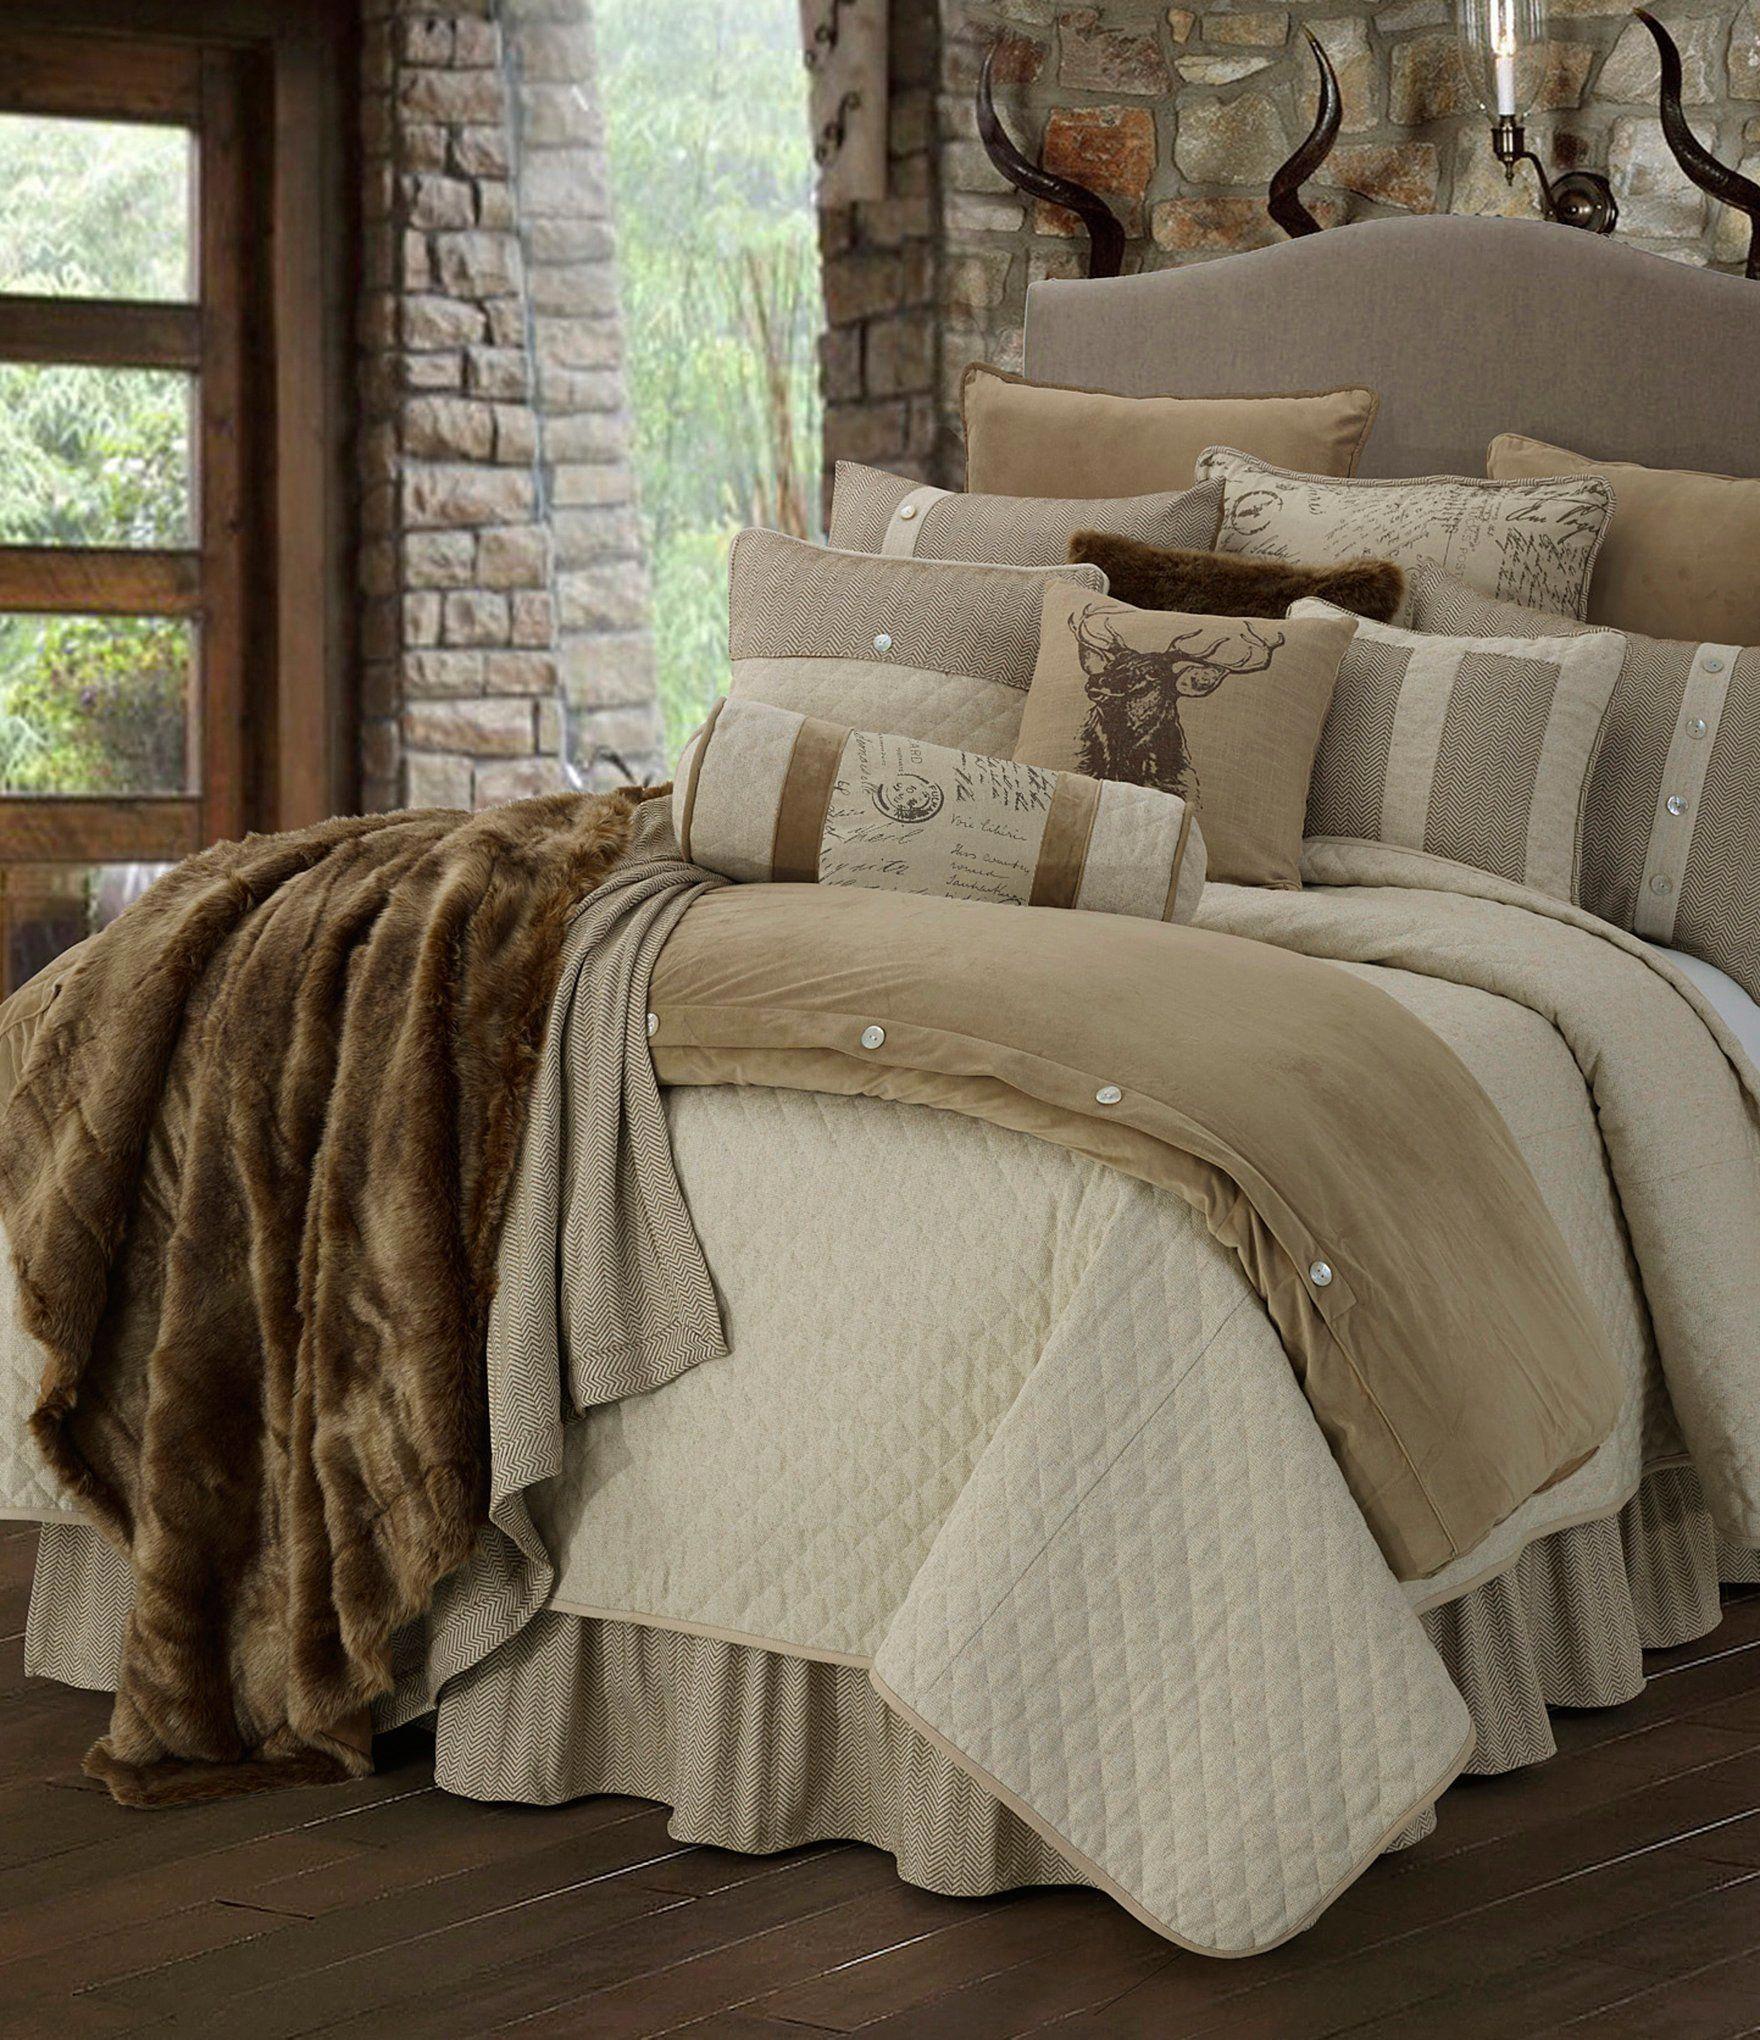 Luxury Bedding Sets On Sale Luxurybeddingbedspreads Code